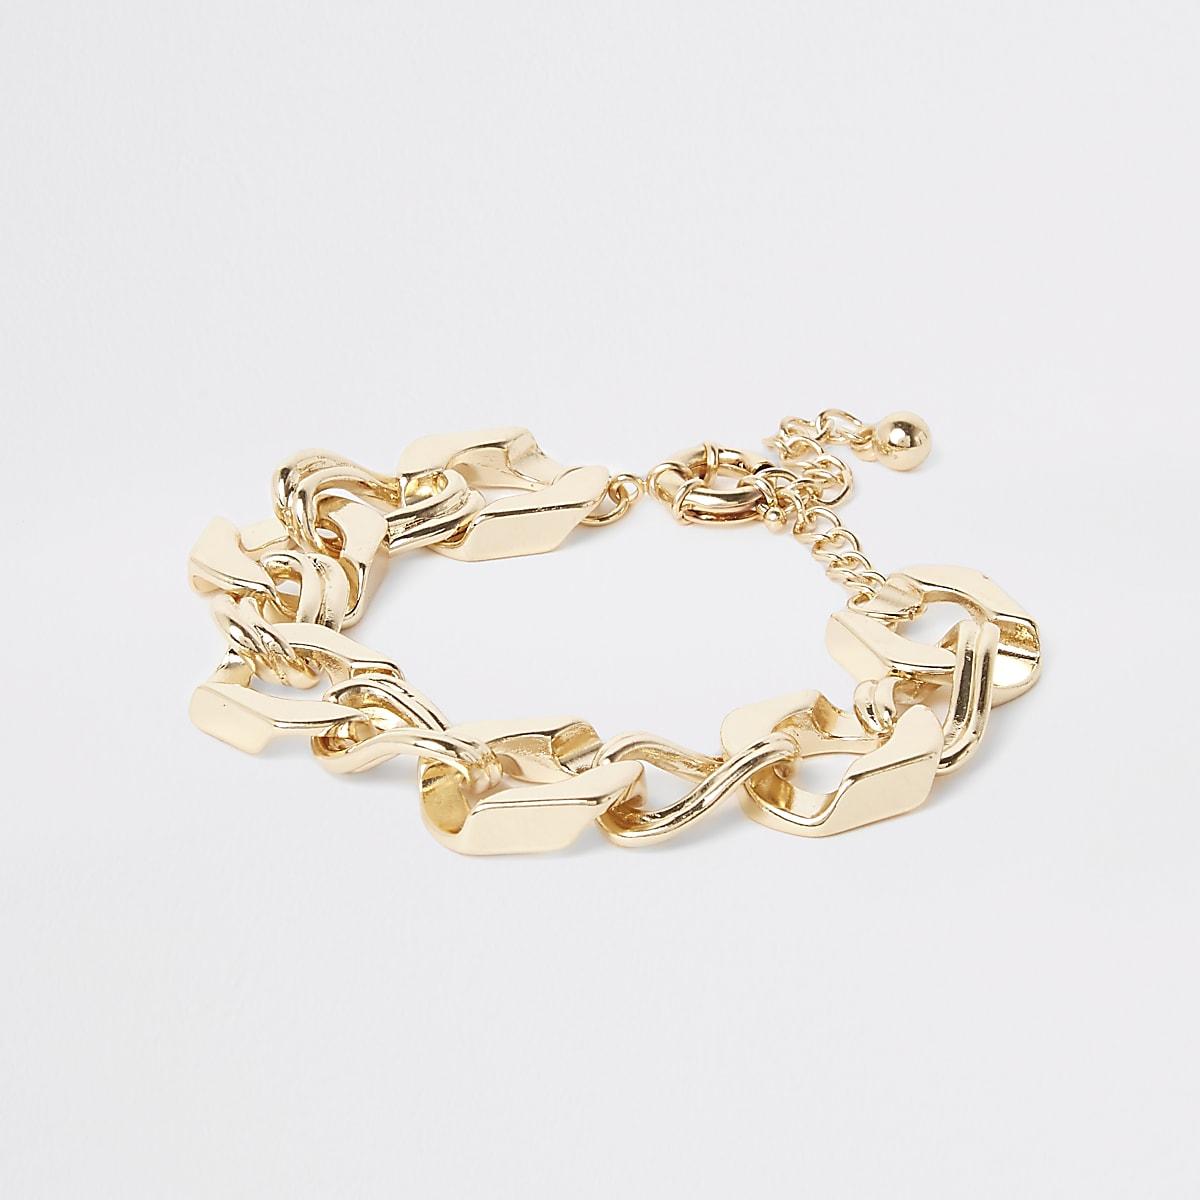 Gold color chunky biker chain bracelet